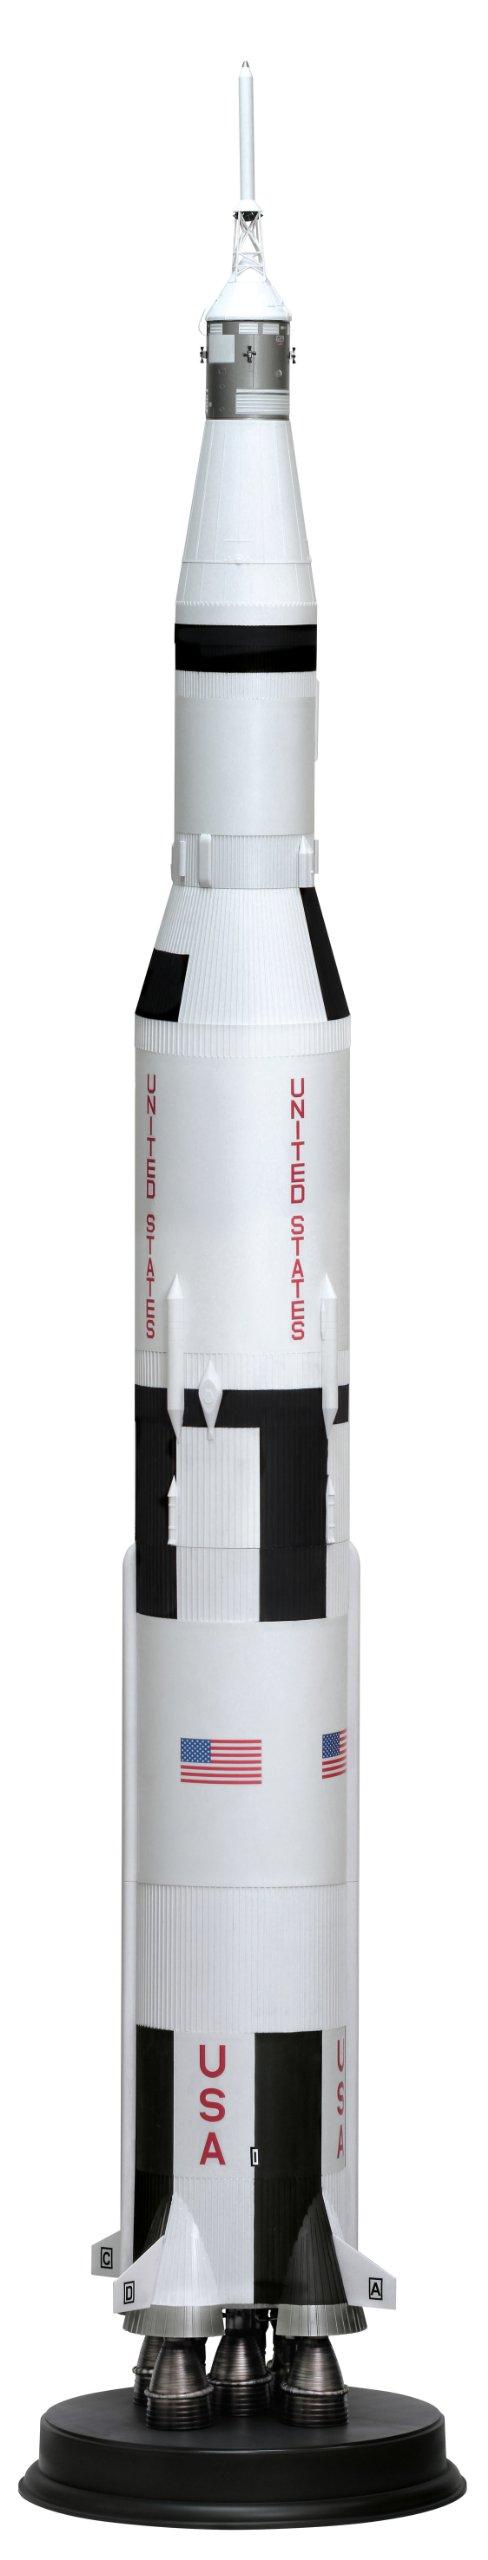 Dragon Models Apollo 11 Saturn V Spacecraft Building Kit, 1/72-Scale